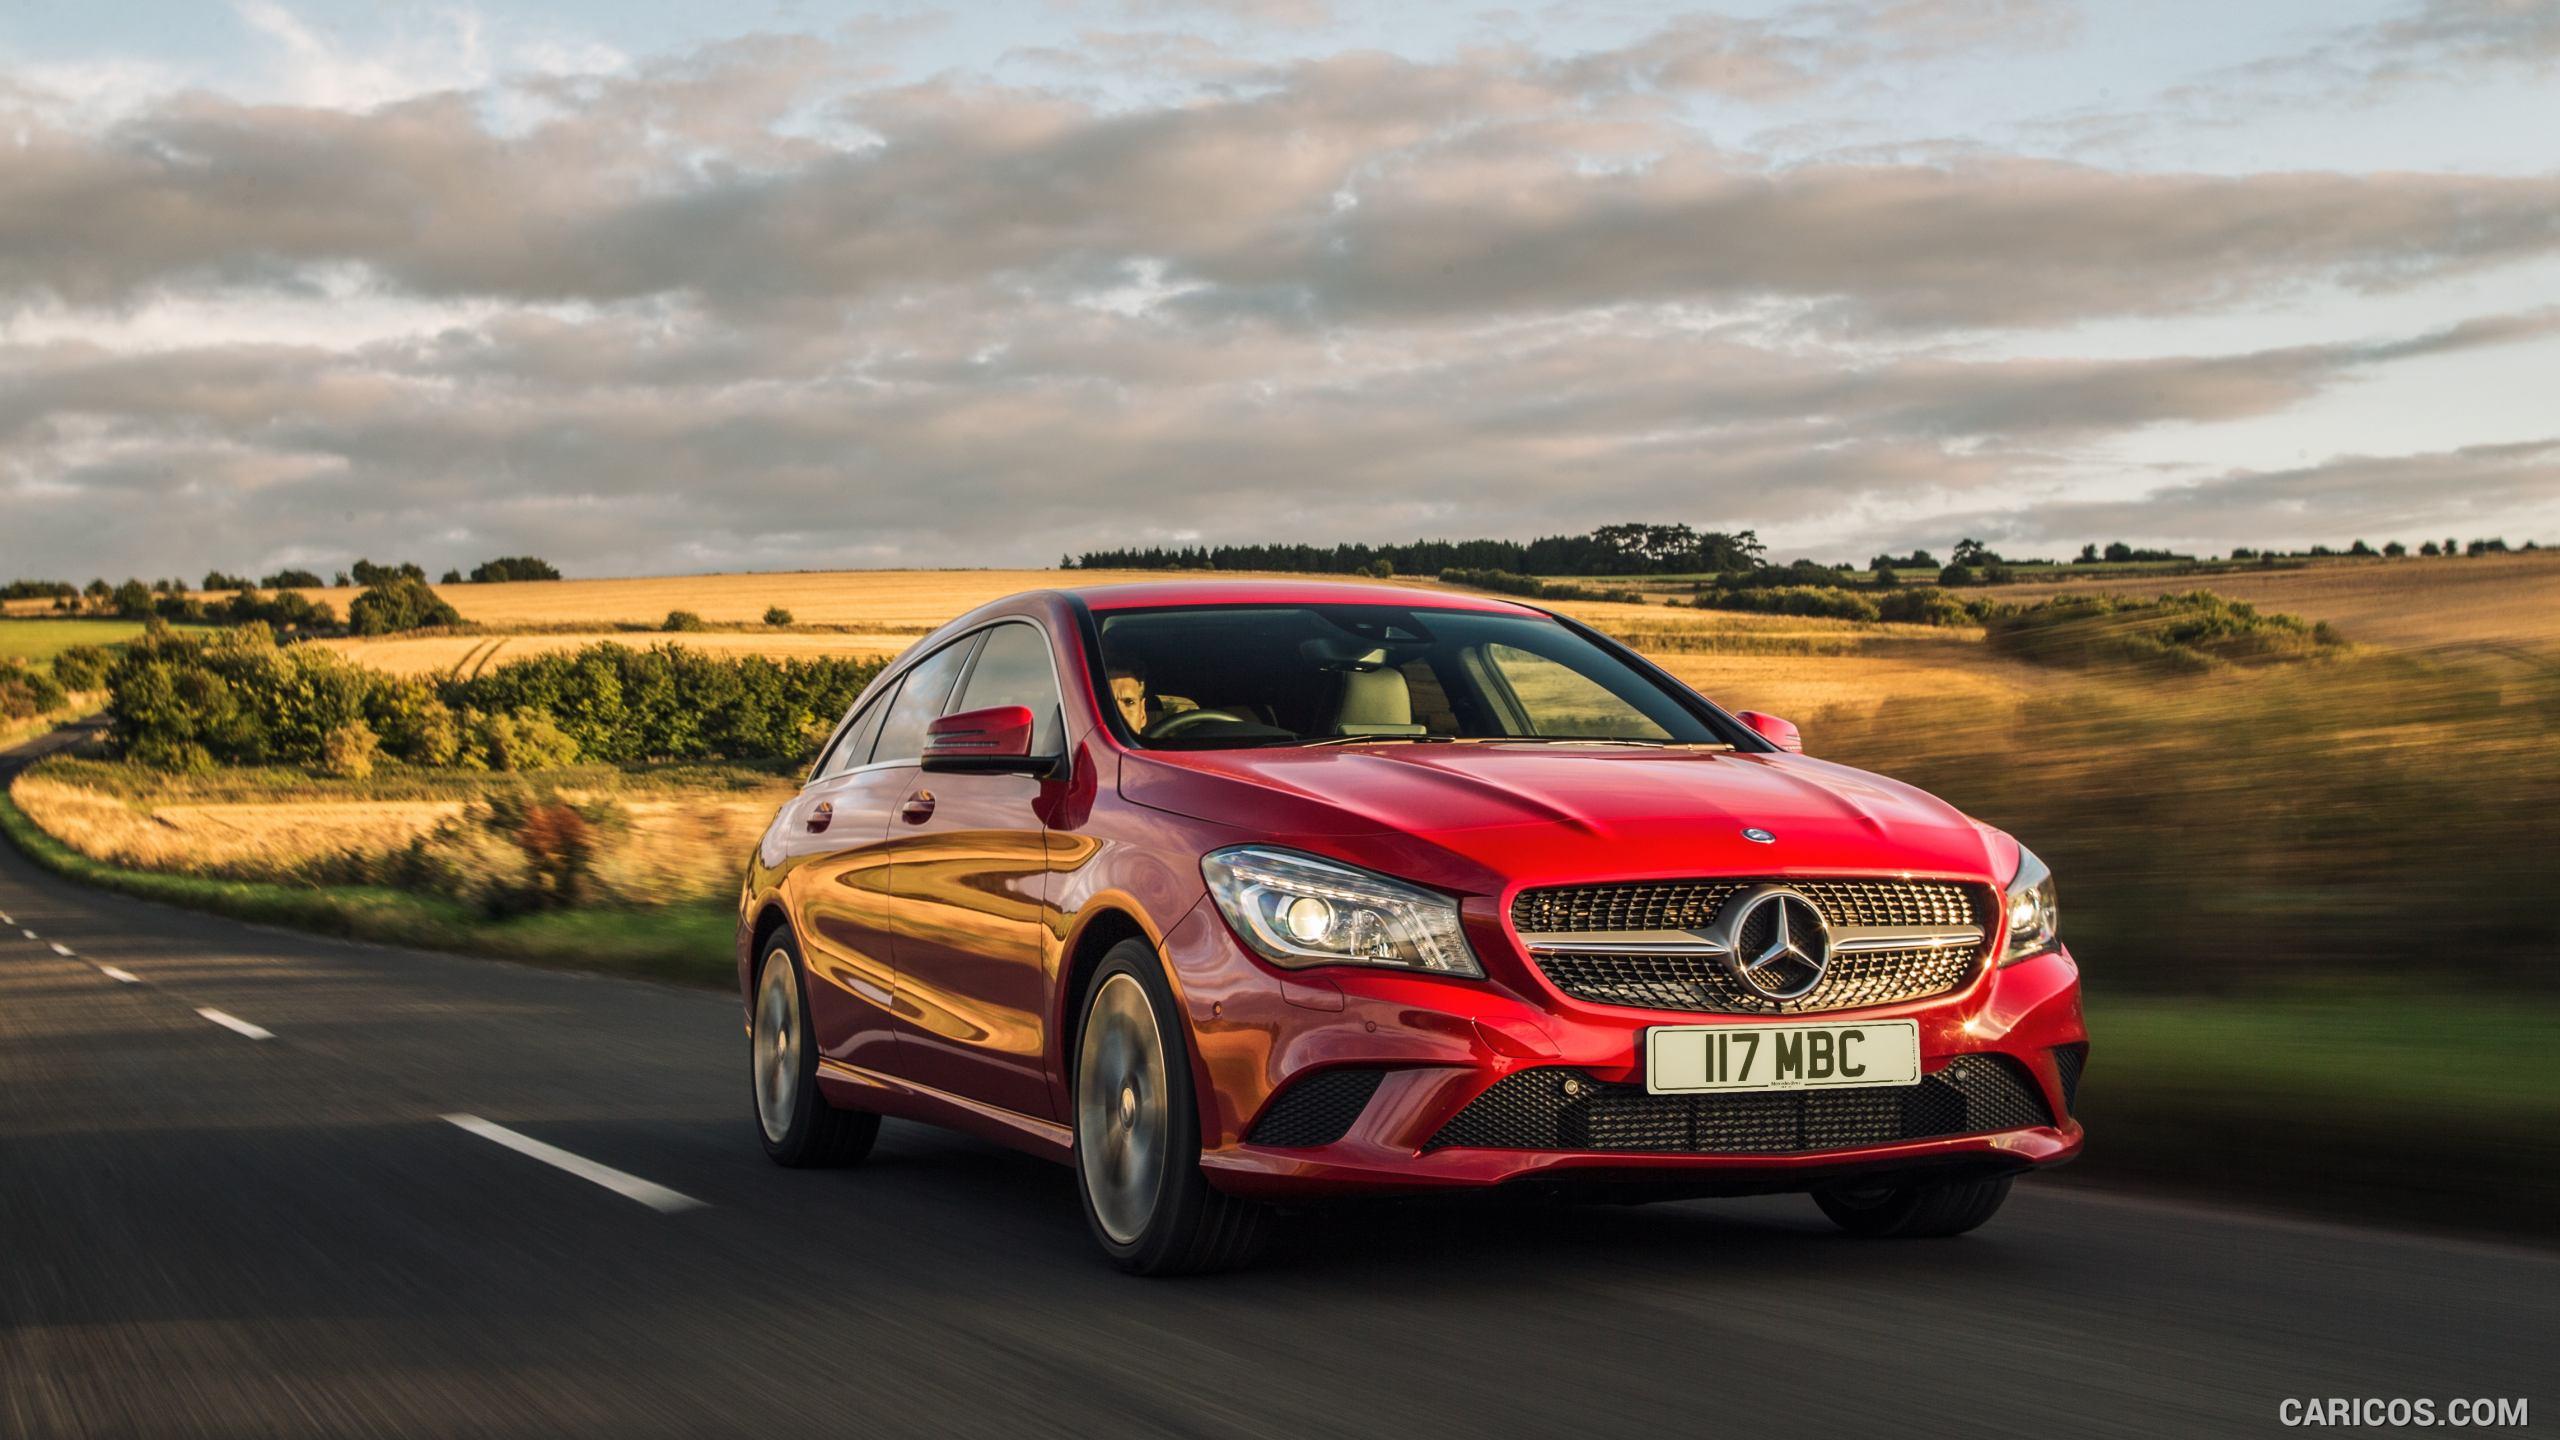 2015 Mercedes Benz CLA 200 CDI Shooting Brake UK Spec   Front 2560x1440